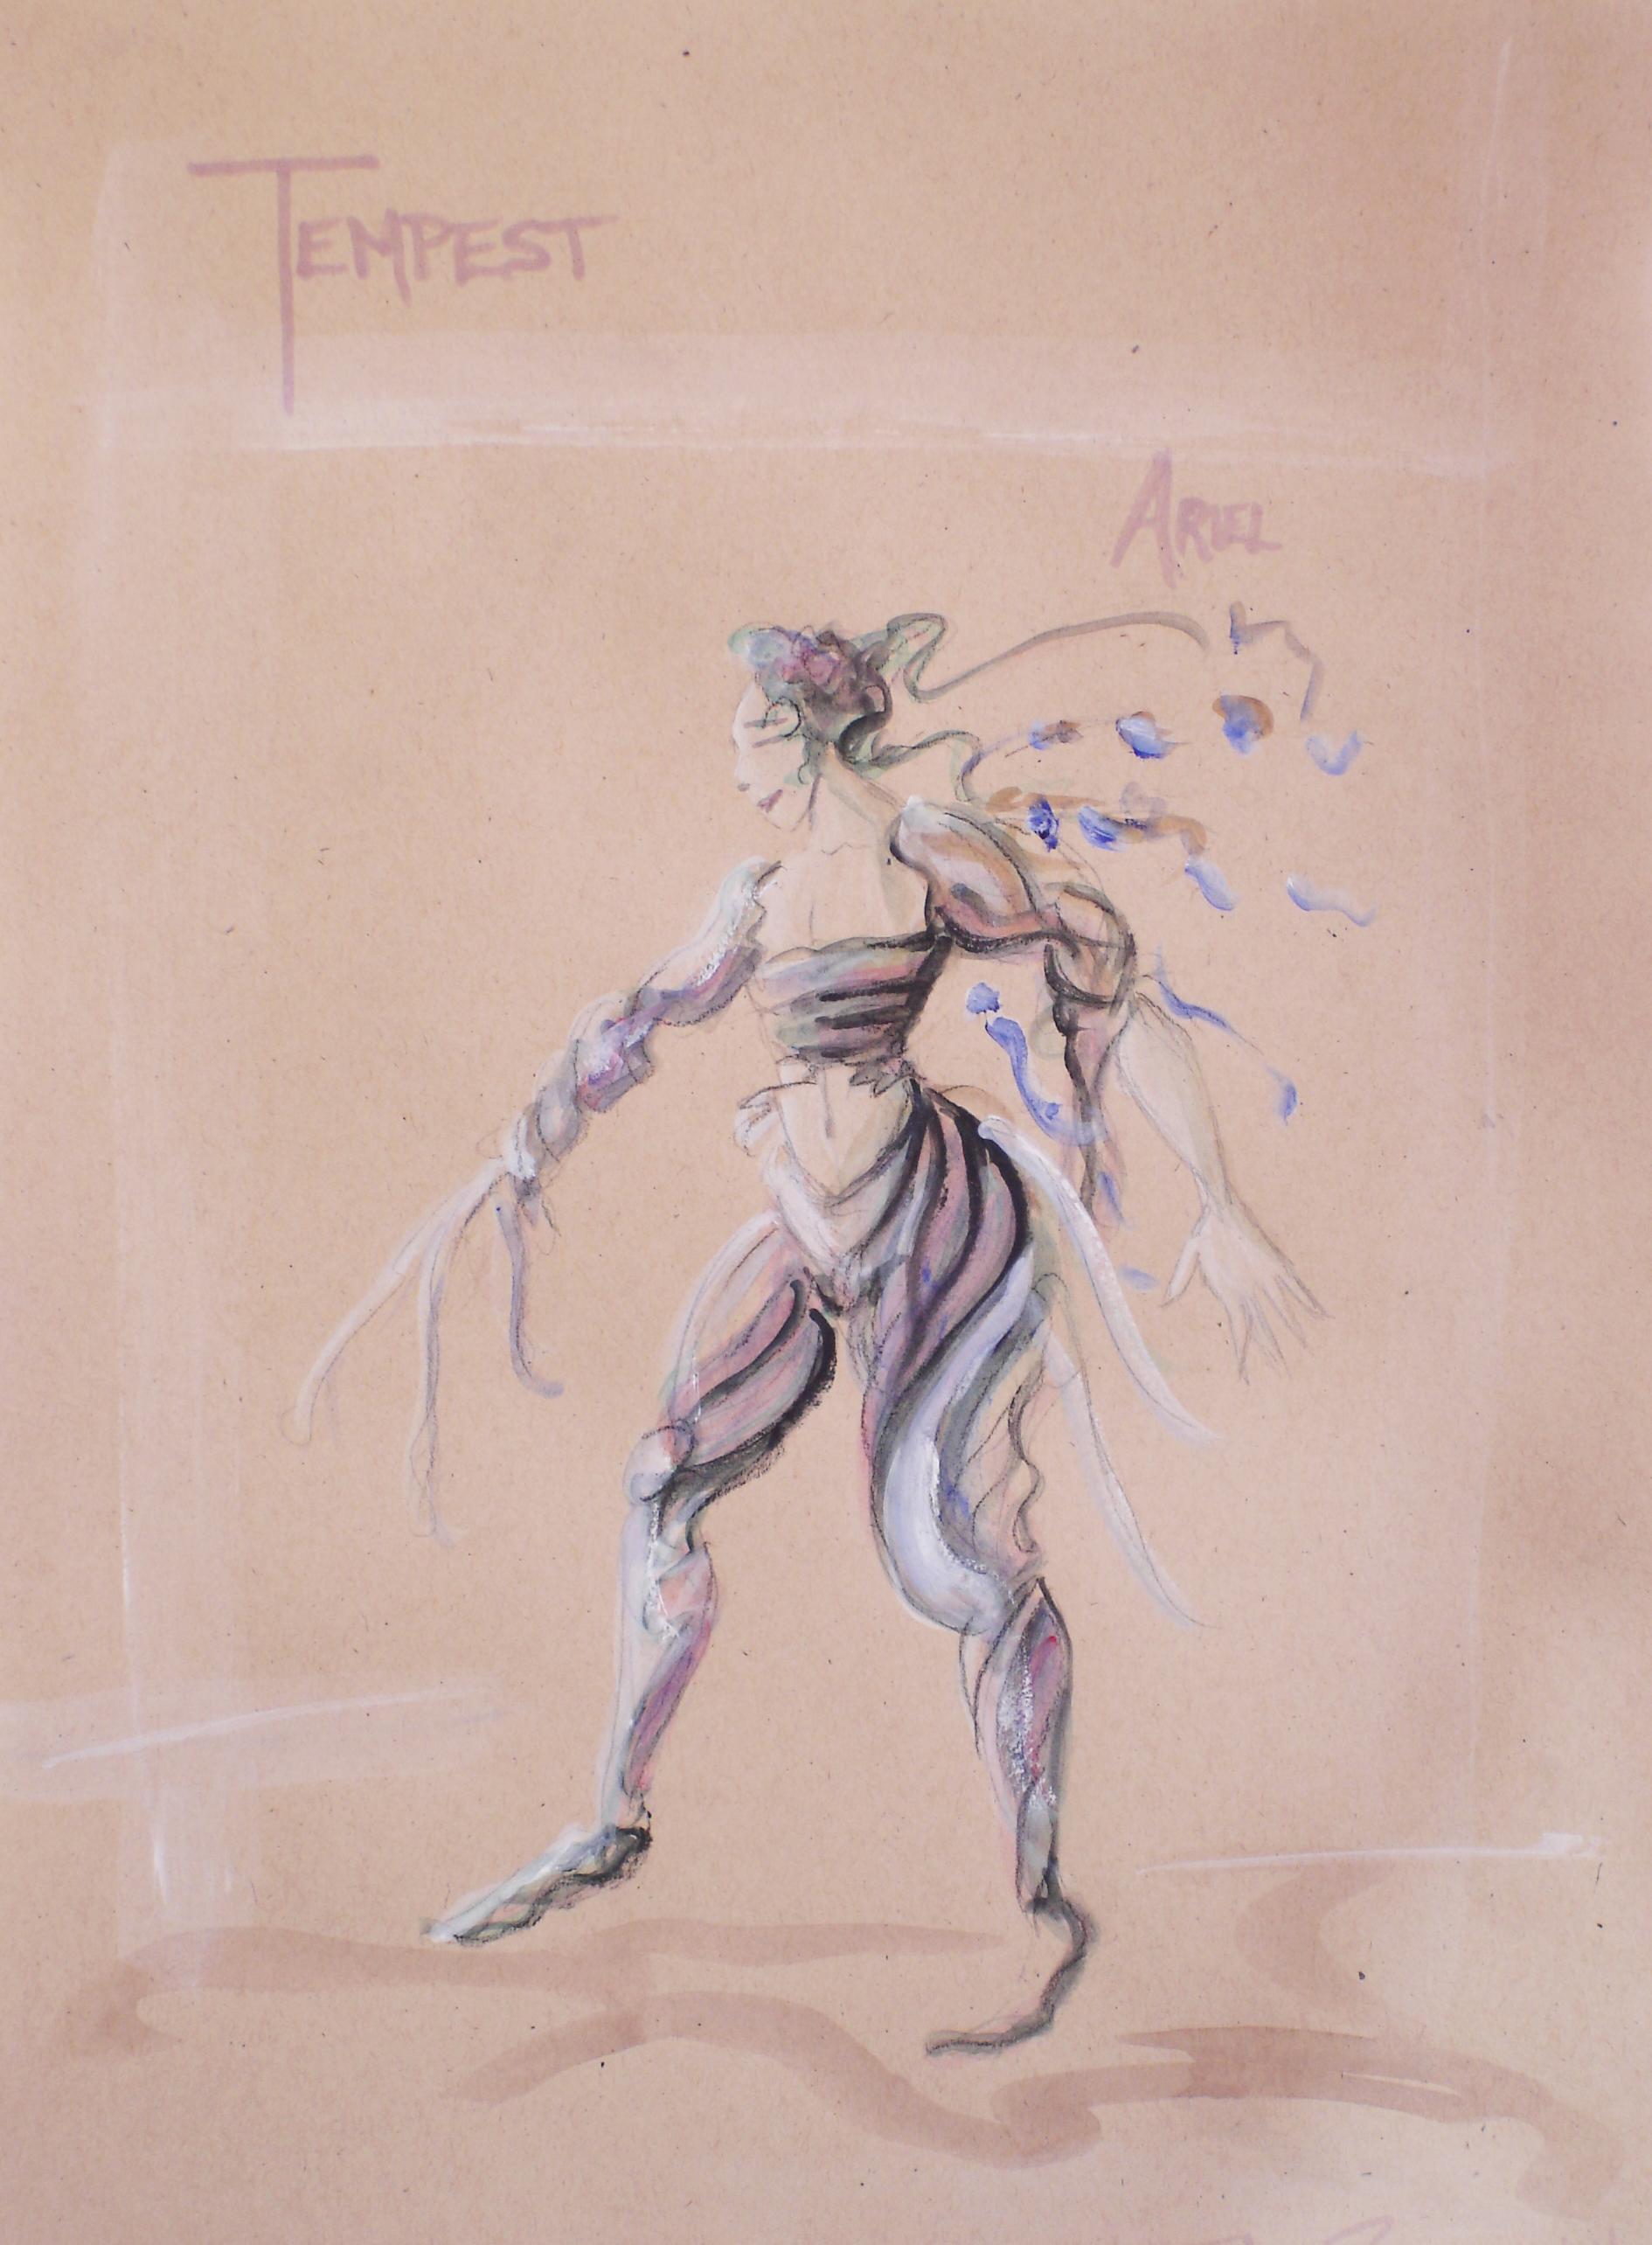 Concept Rendering - Ariel, The Tempest